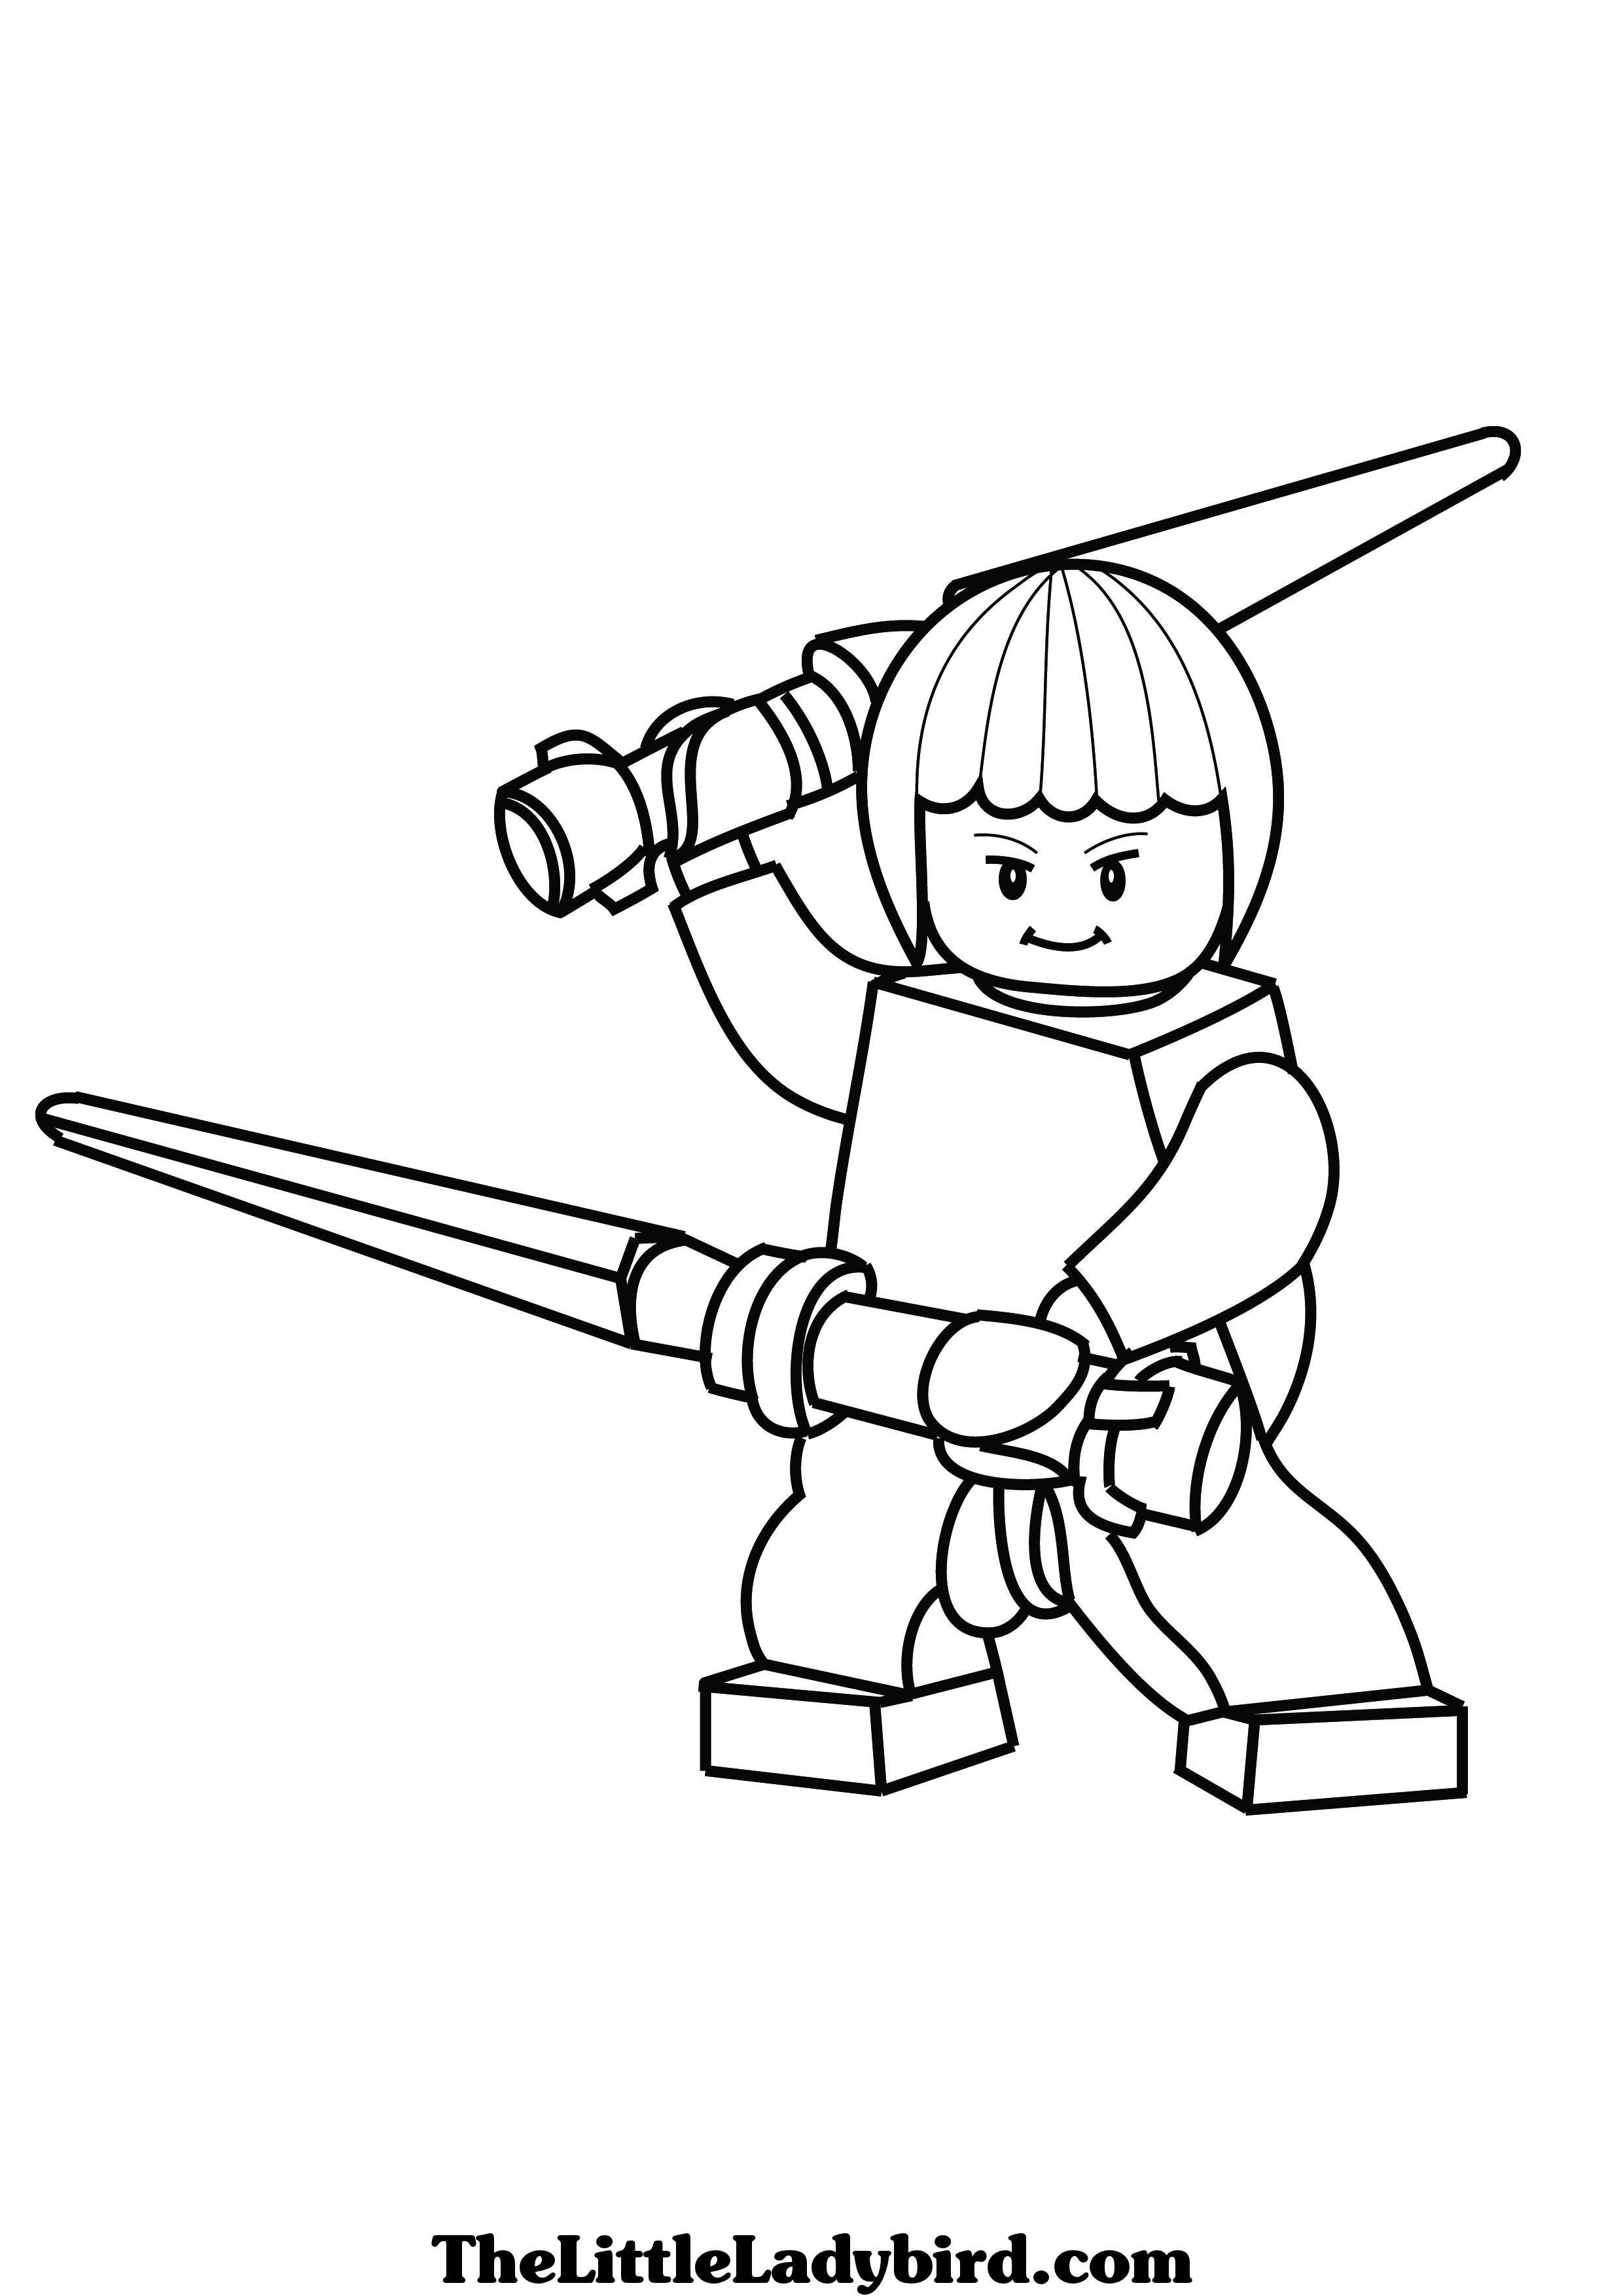 Coloriage ninjago gratuit - dessin a imprimer #72